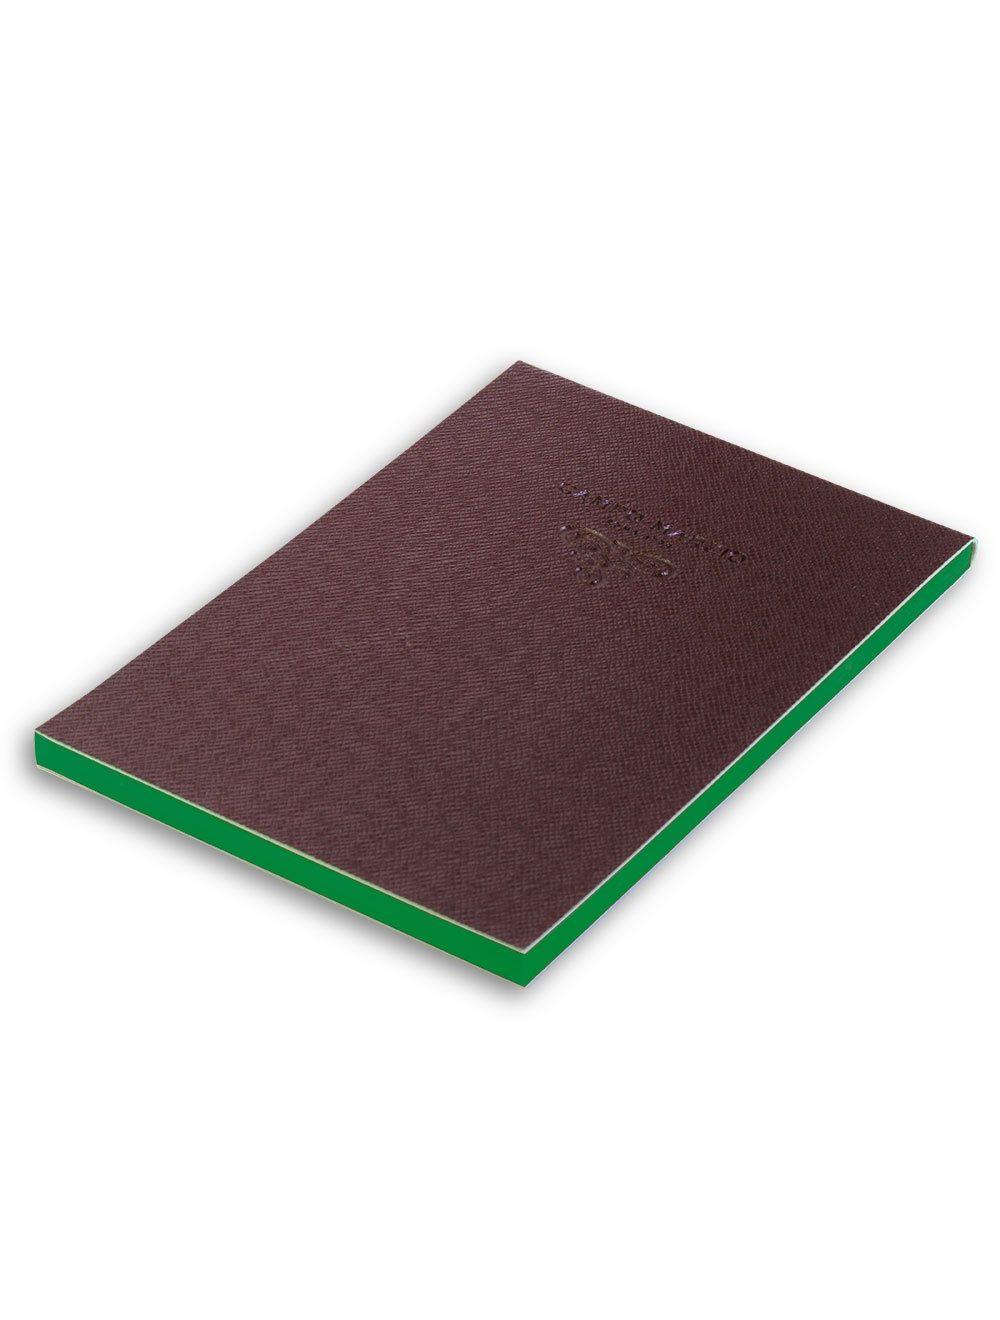 Notes 15 X 21 Cm Saffiano - Brown